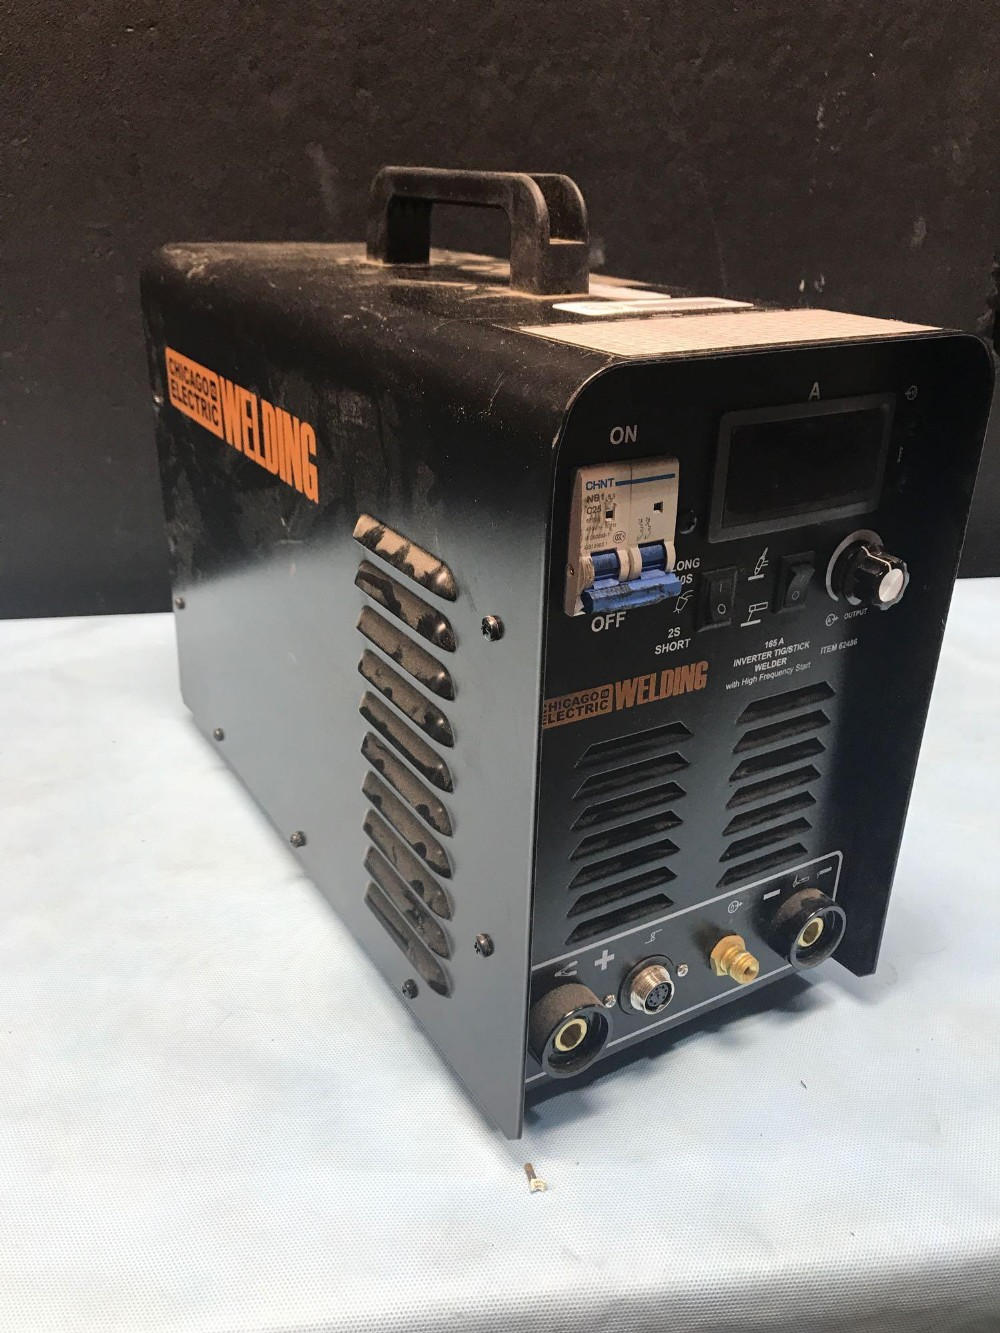 Lot 7 - CHICAGO ELECTRIC WELDING 165A INVERTER TIG / STICK WELDER